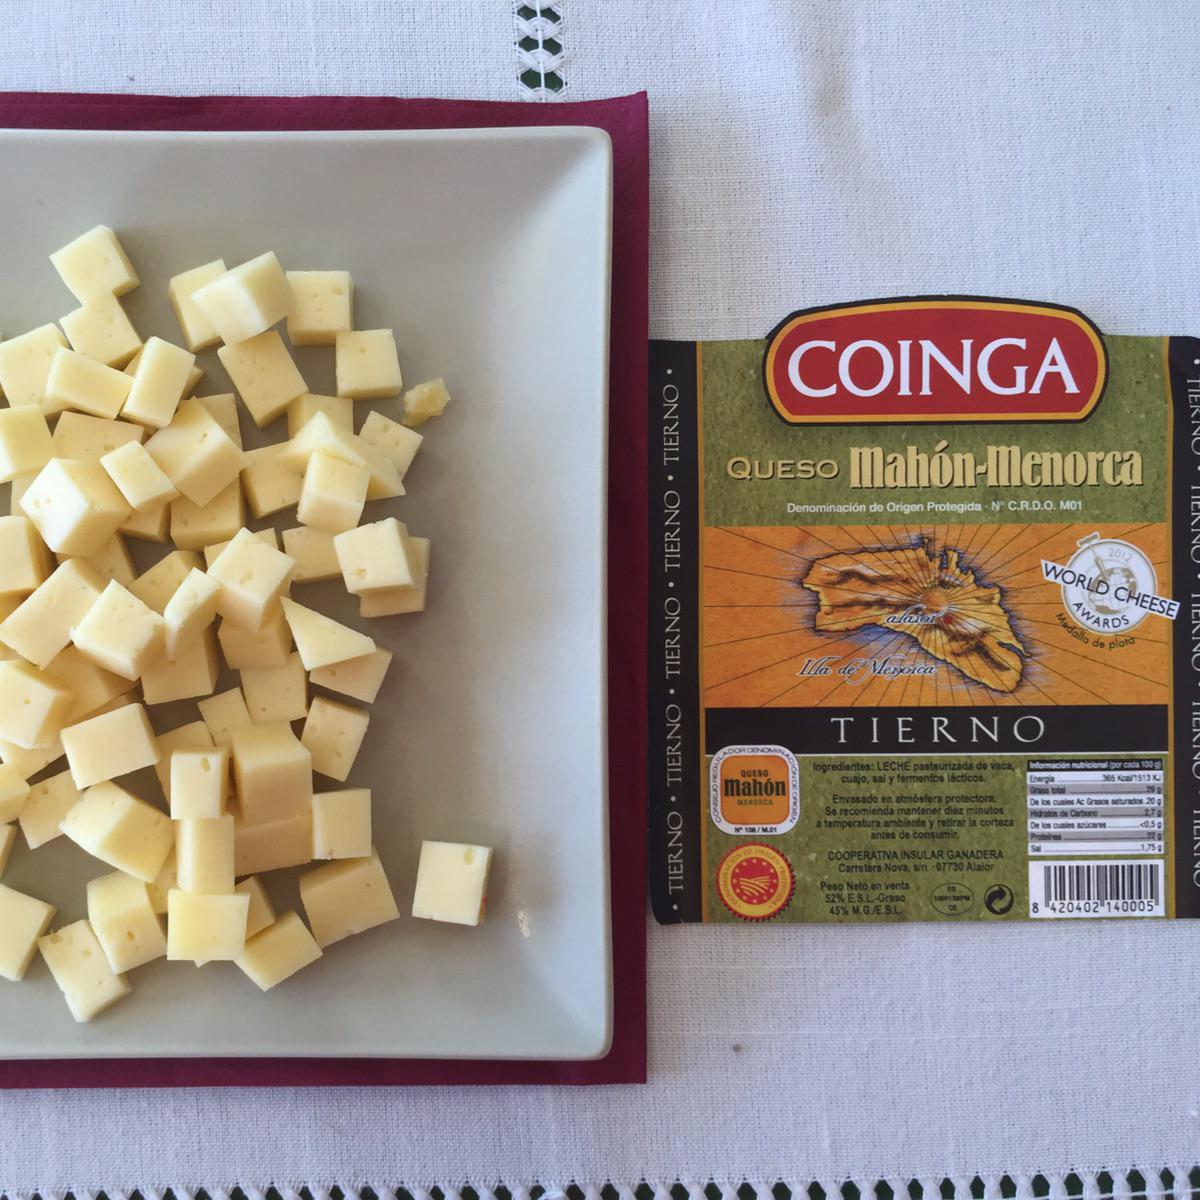 queso_tierno_coinga